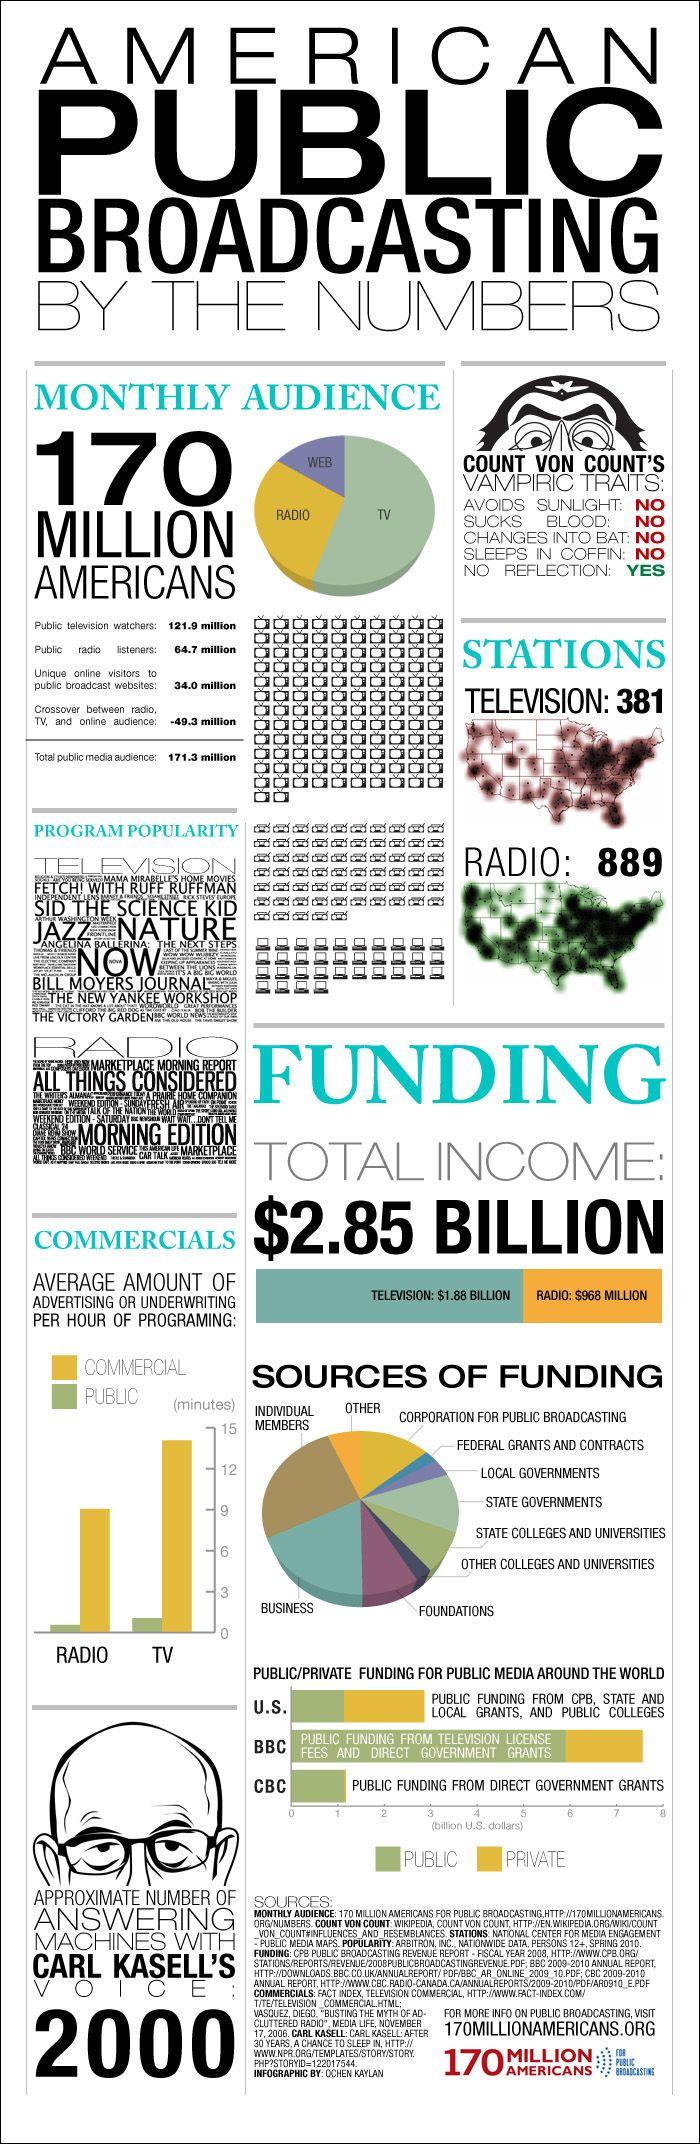 http://170millionamericans.org/sites/apb.civicactions.net/files/170_Million_Americans_infographic.jpg